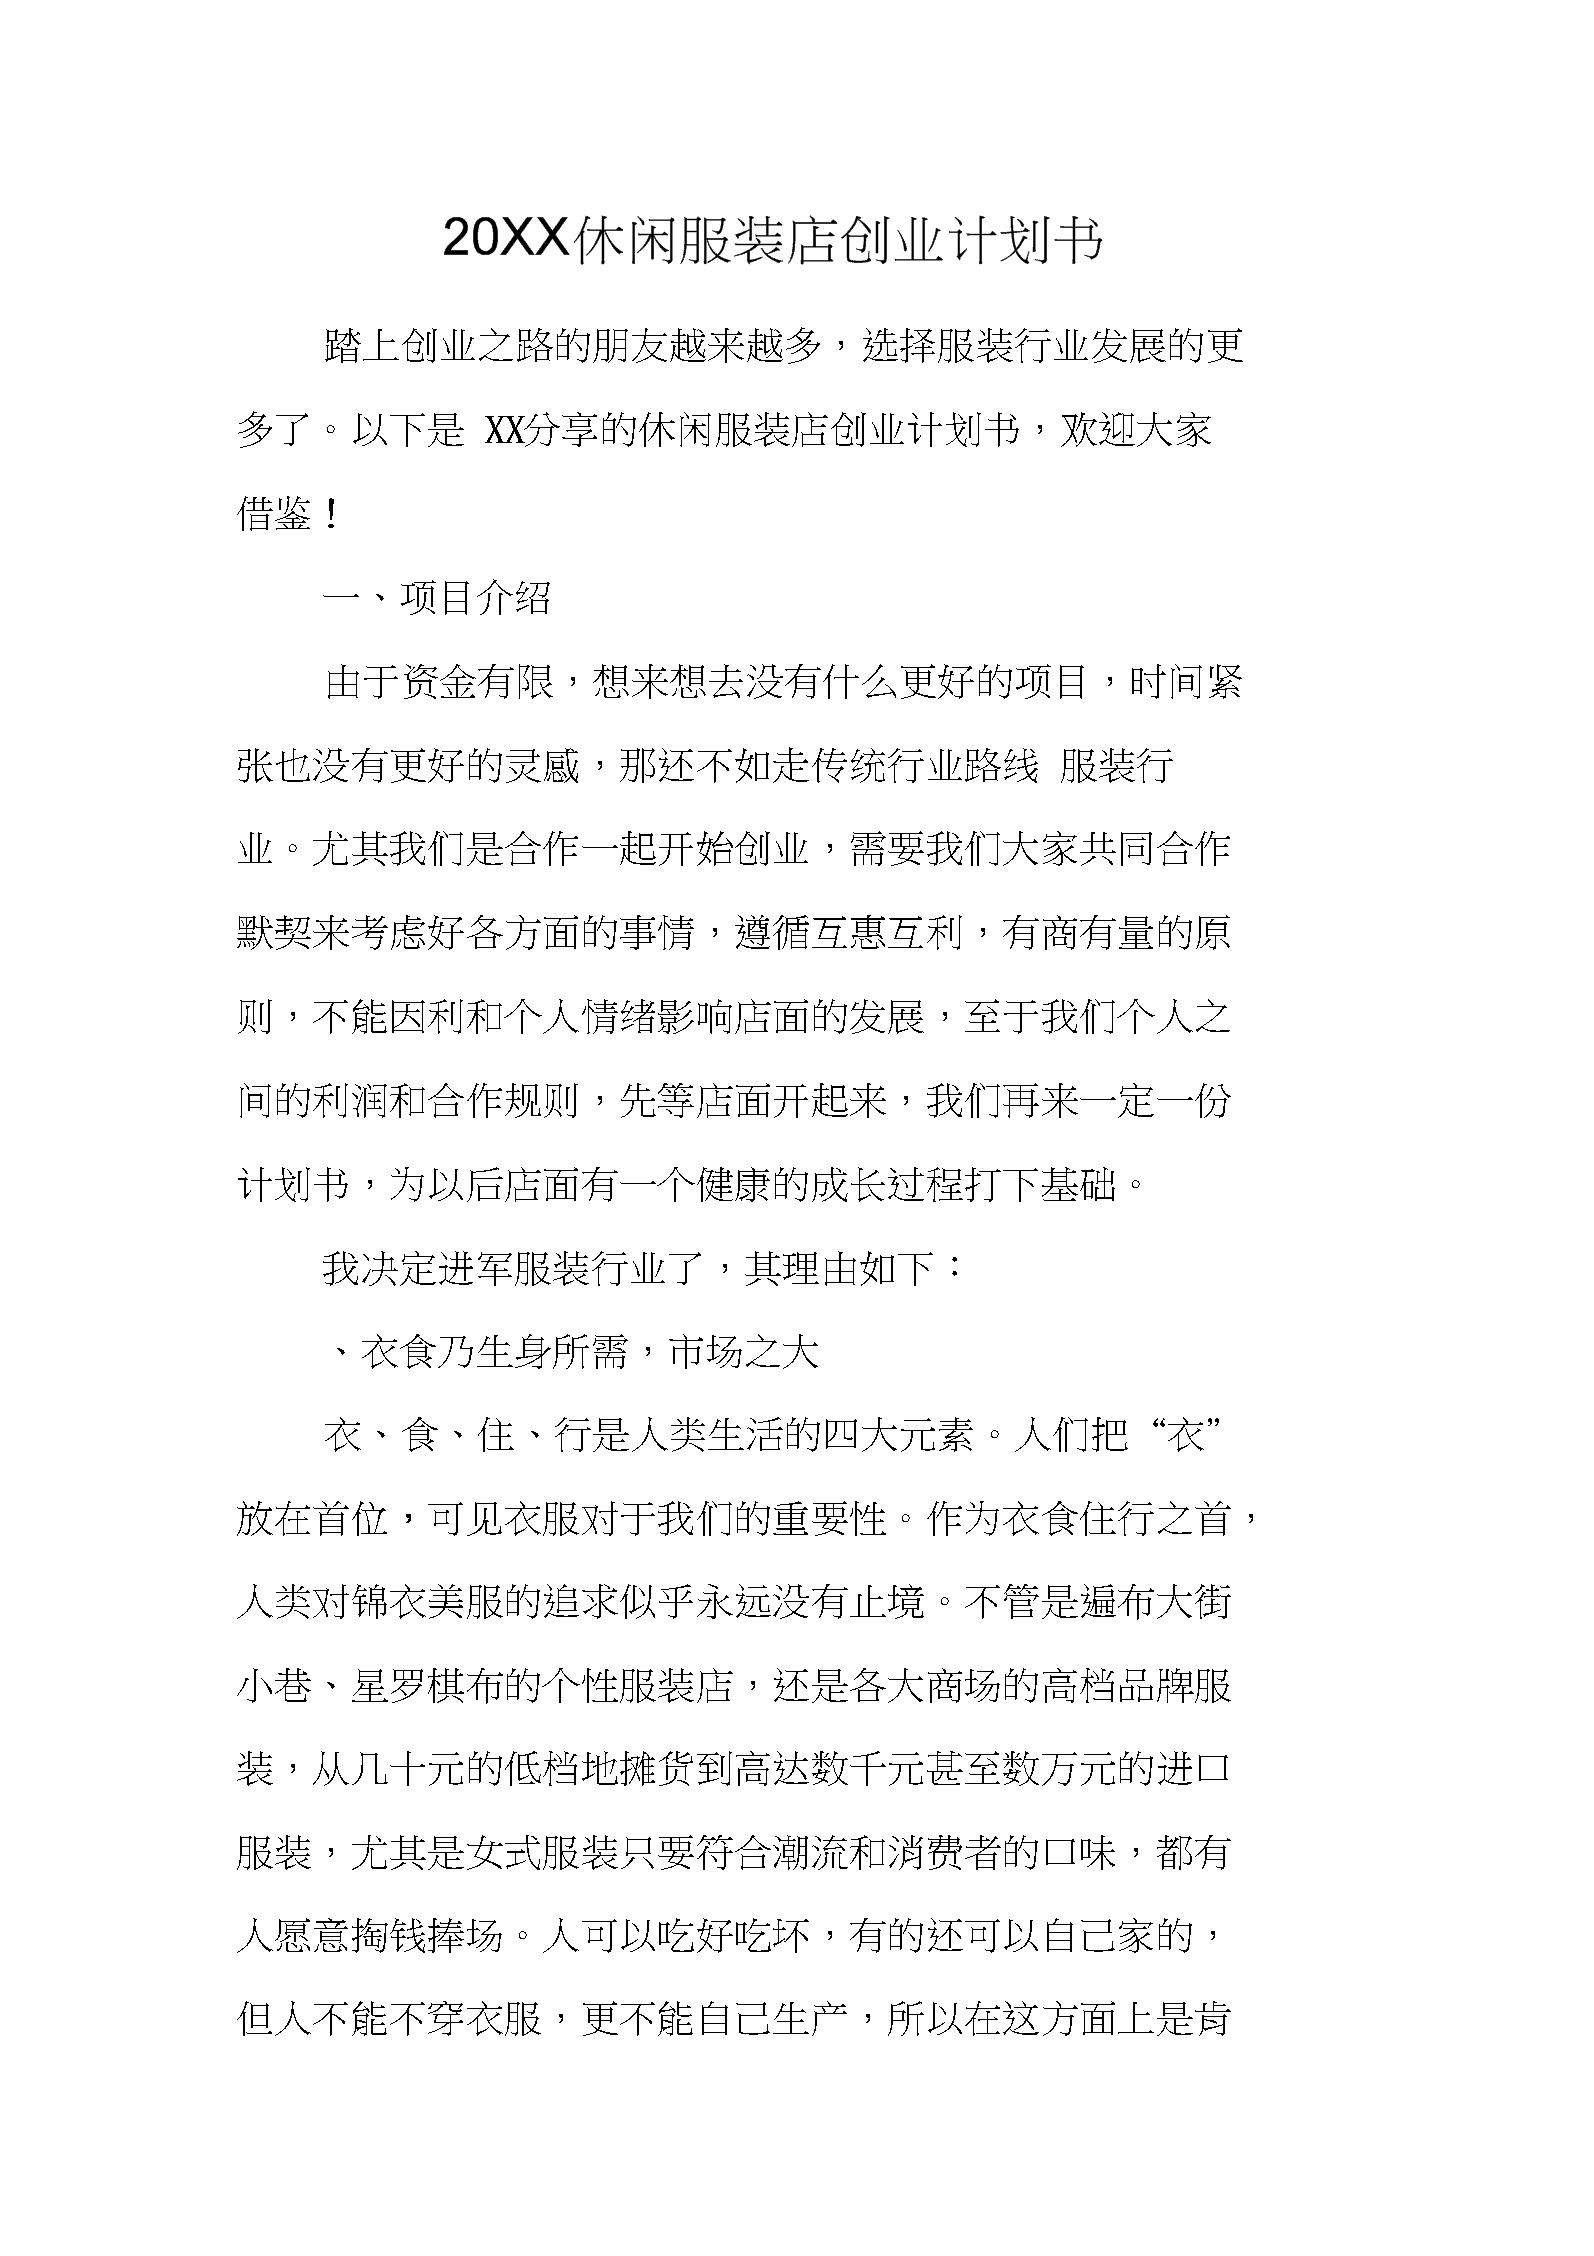 20XX休闲服装店创业计划书.docx